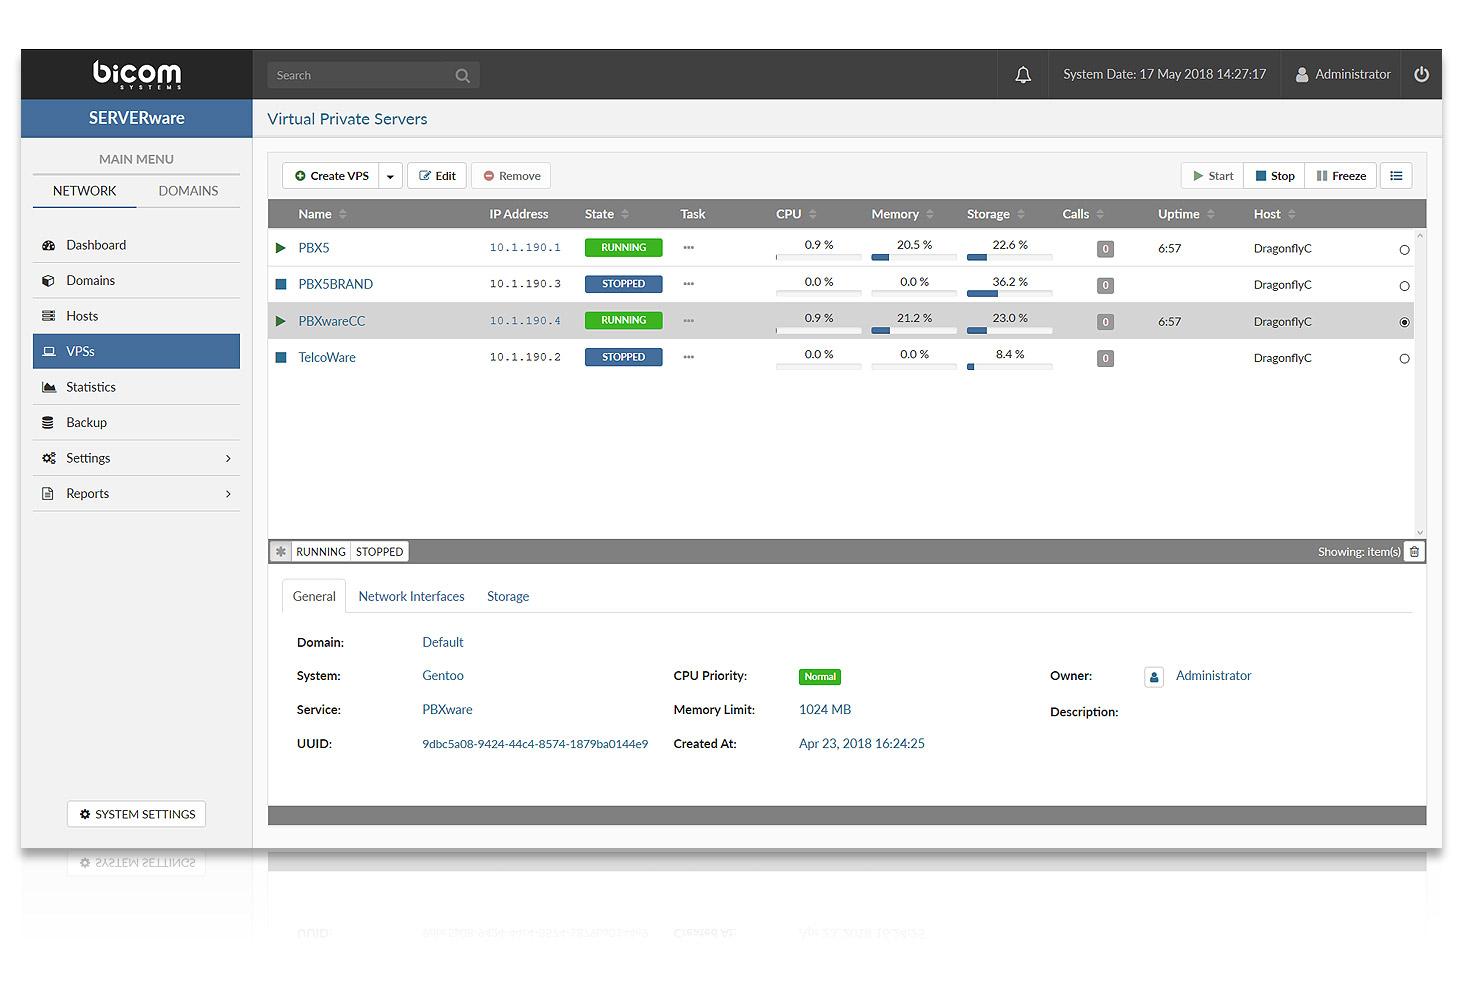 SERVERware Virtualization Platform - VPSs